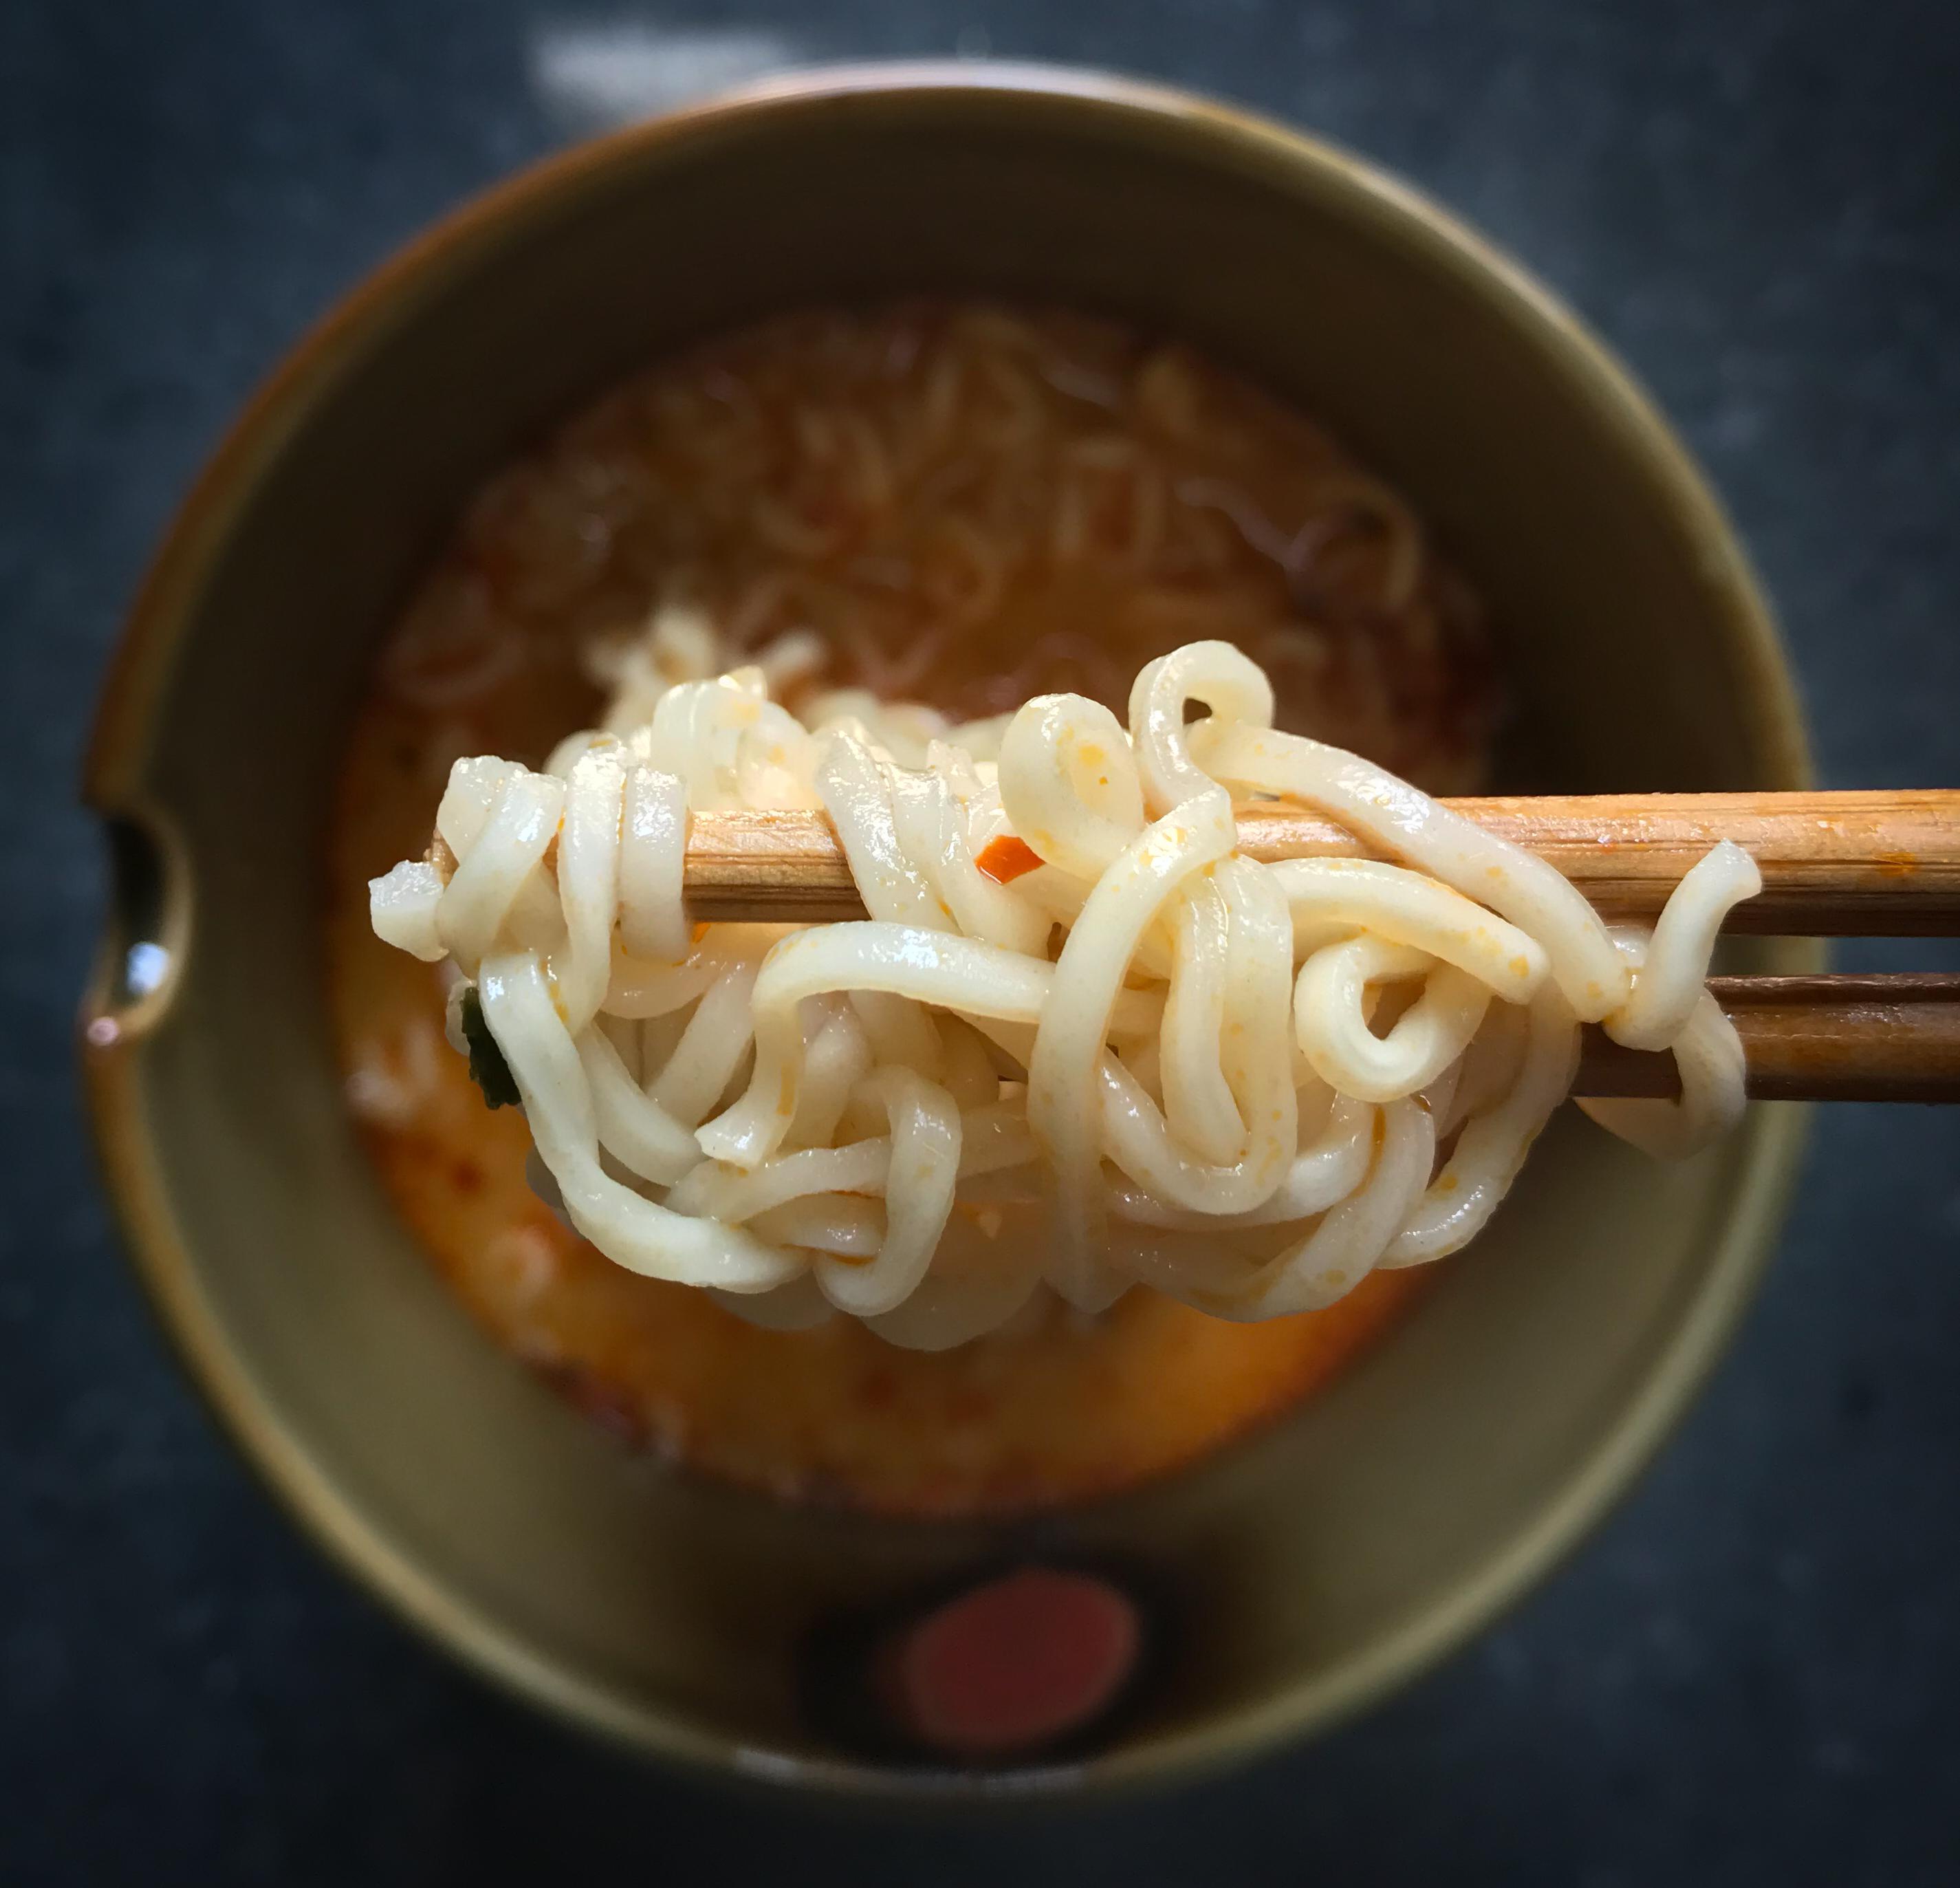 70. KOKA Laksa Singapura Flavor Instant Noodles